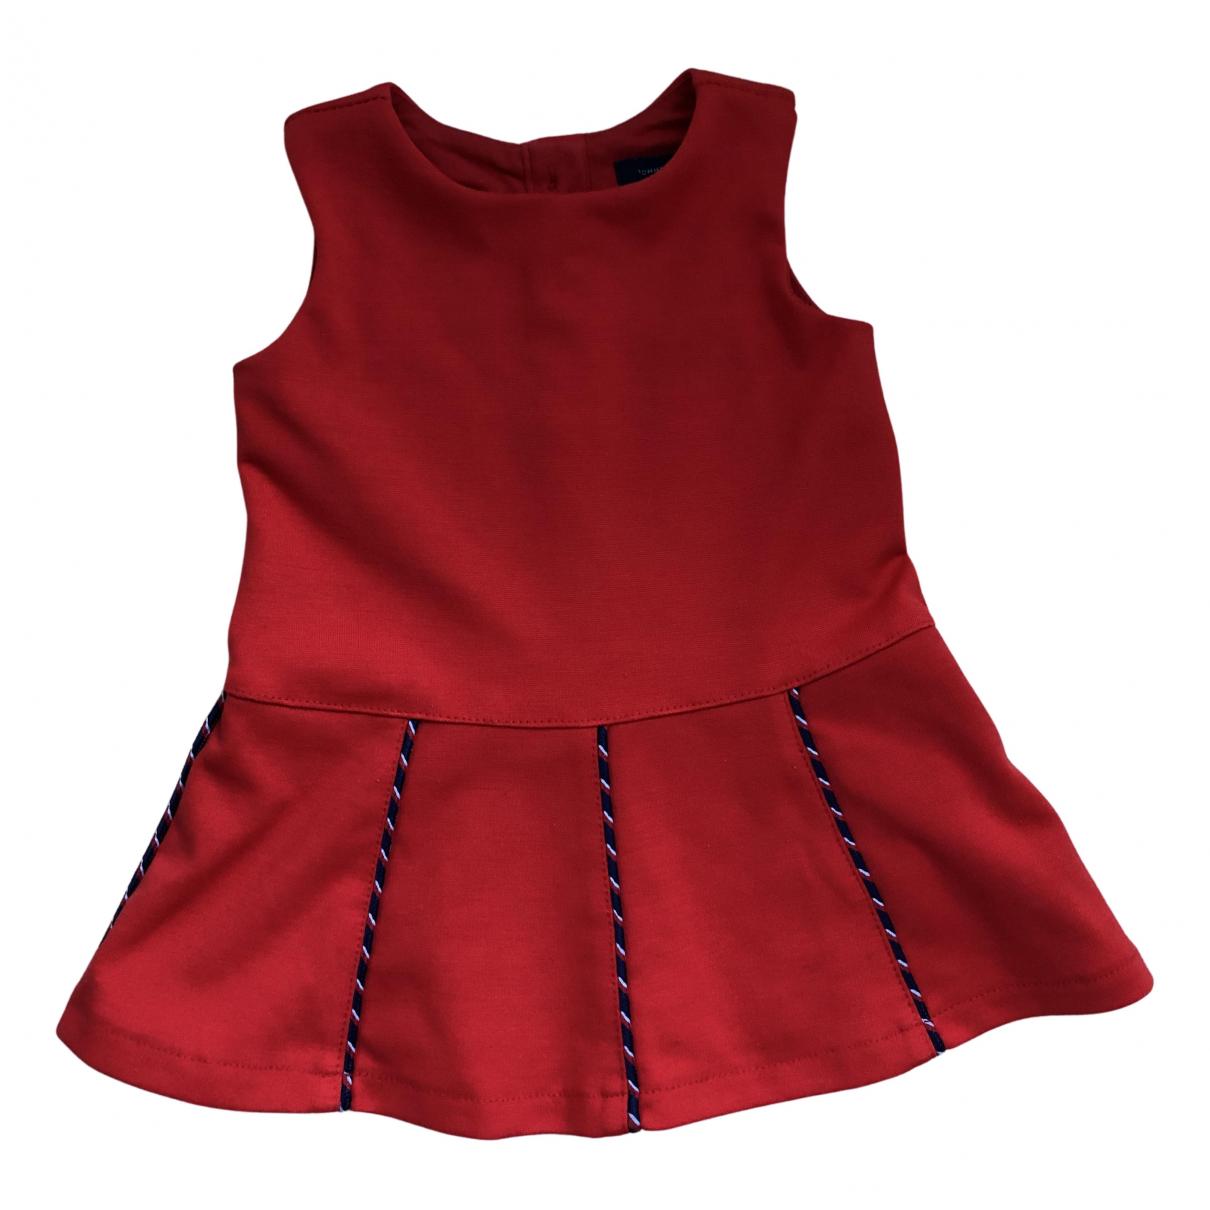 Tommy Hilfiger N Red Cotton dress for Kids 6 months - up to 67cm FR